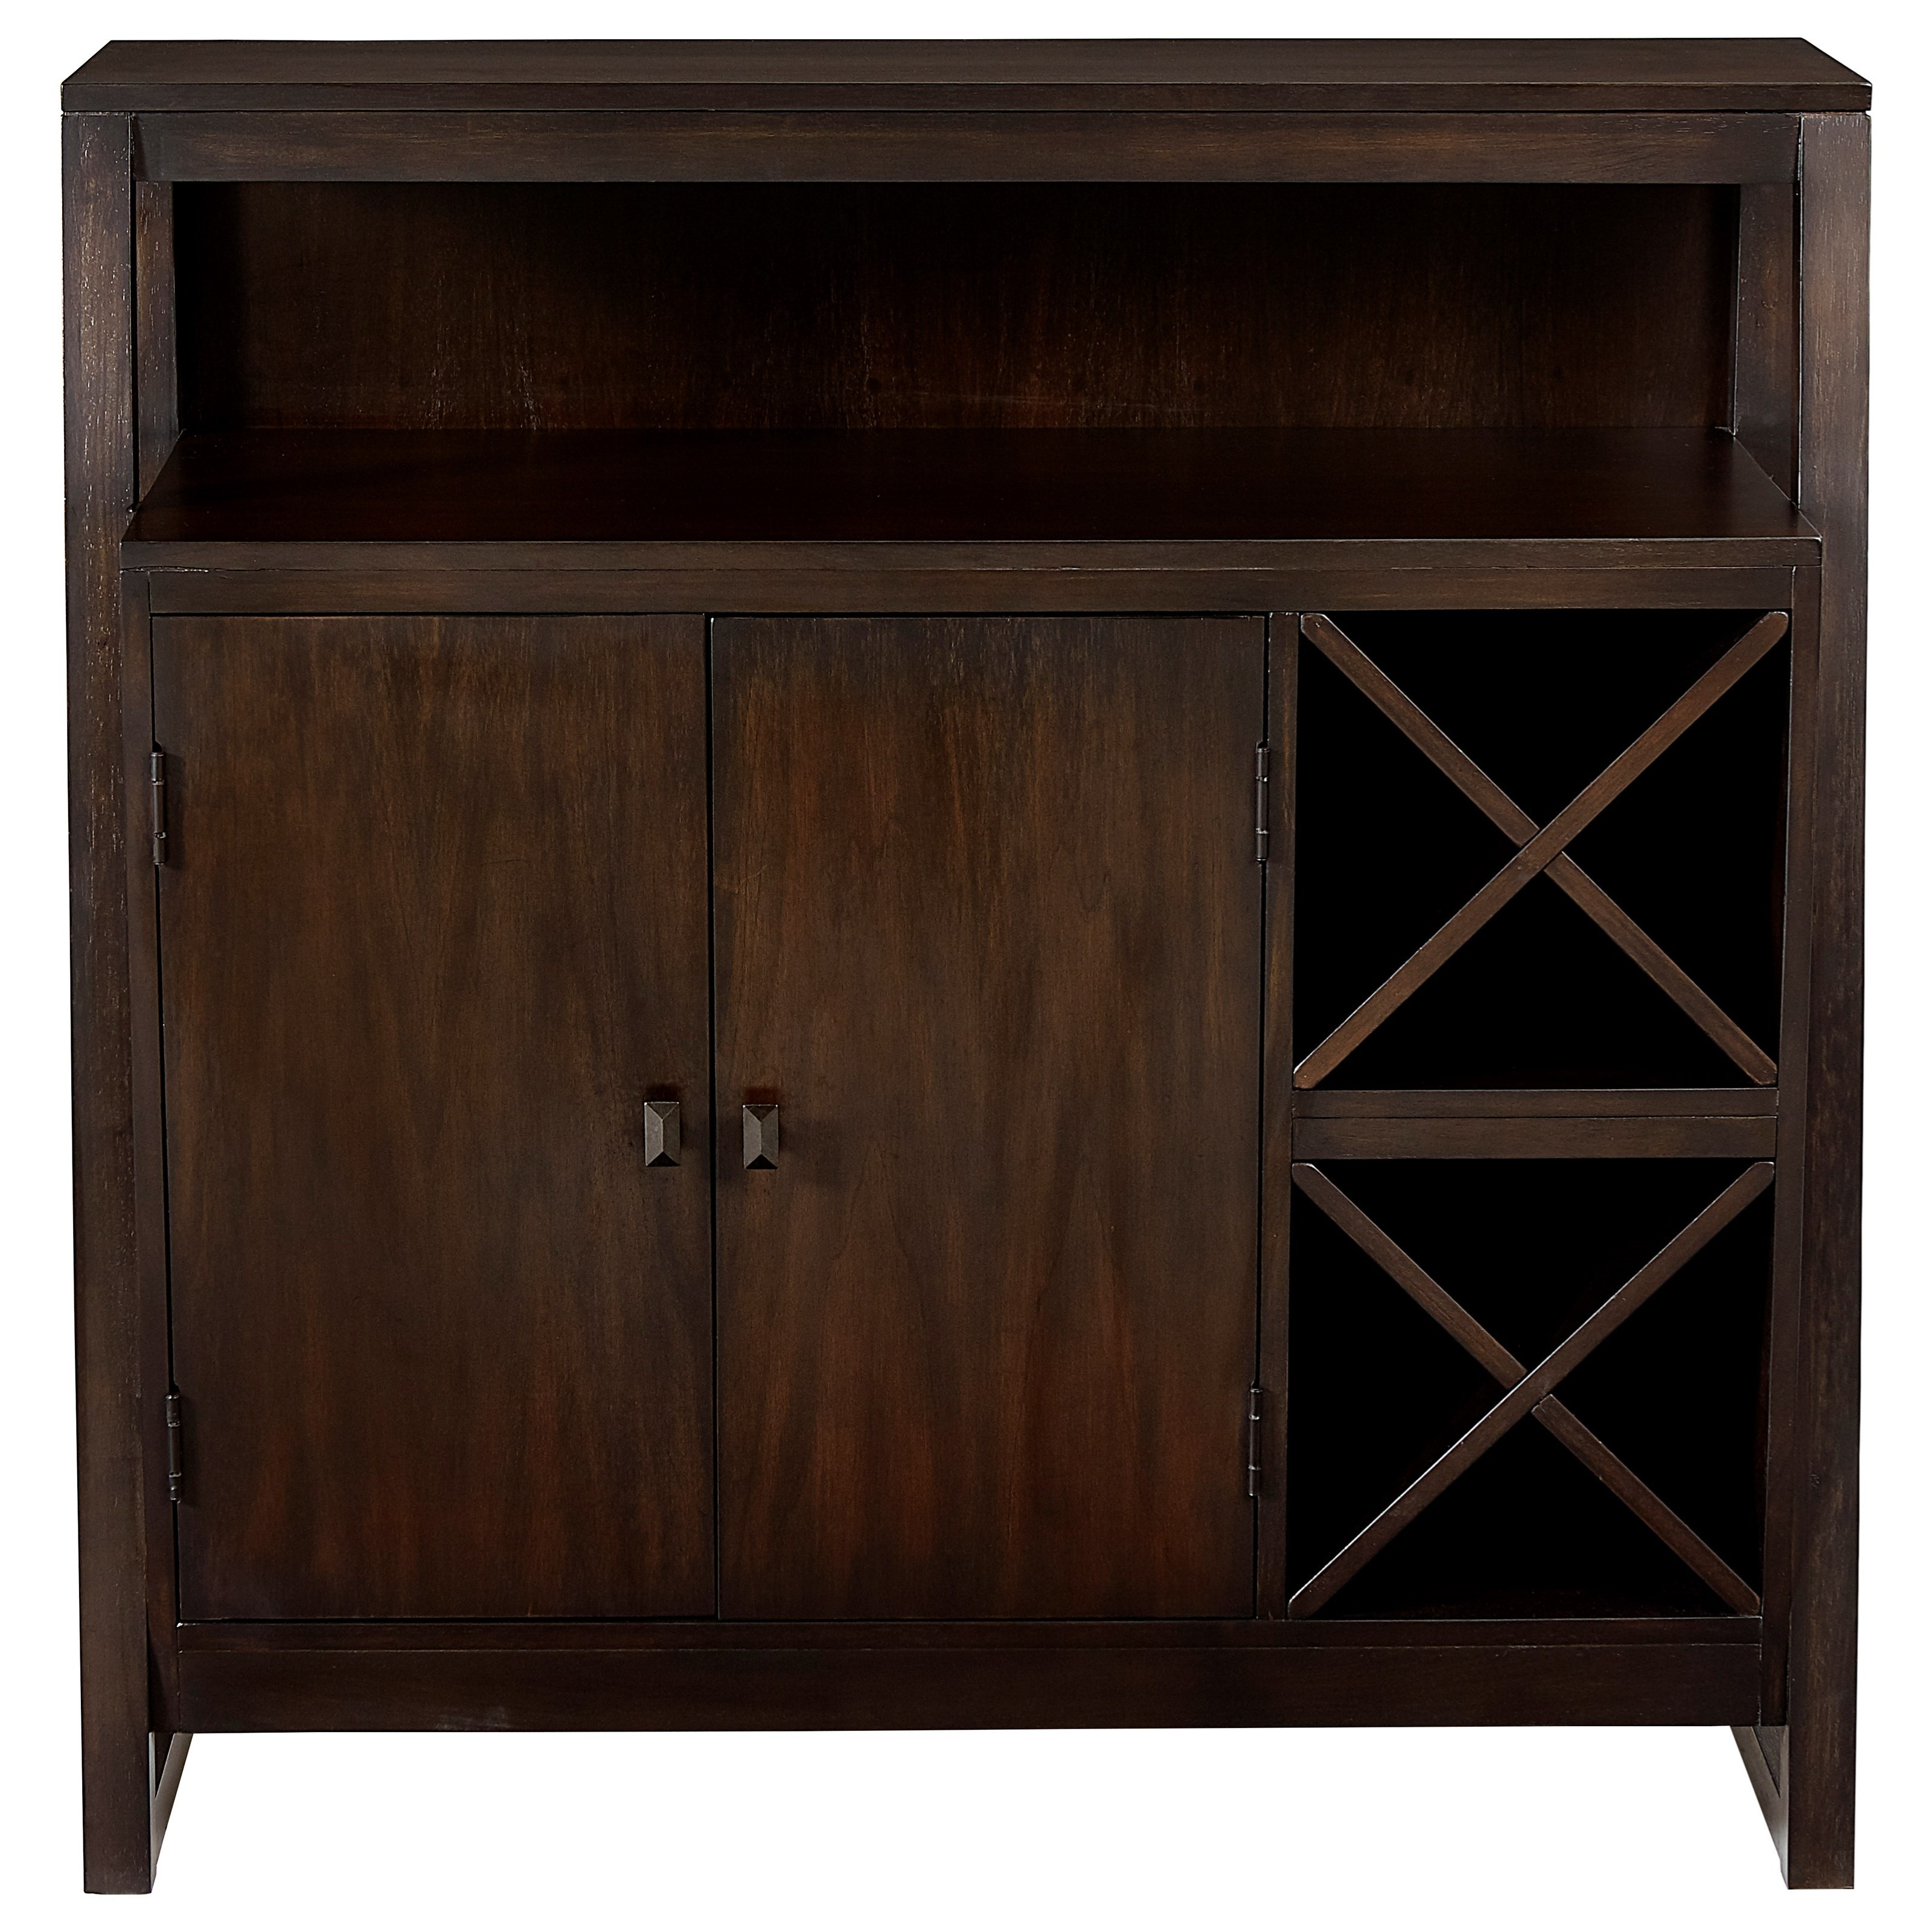 Trusses Sideboard by Progressive Furniture at Catalog Outlet